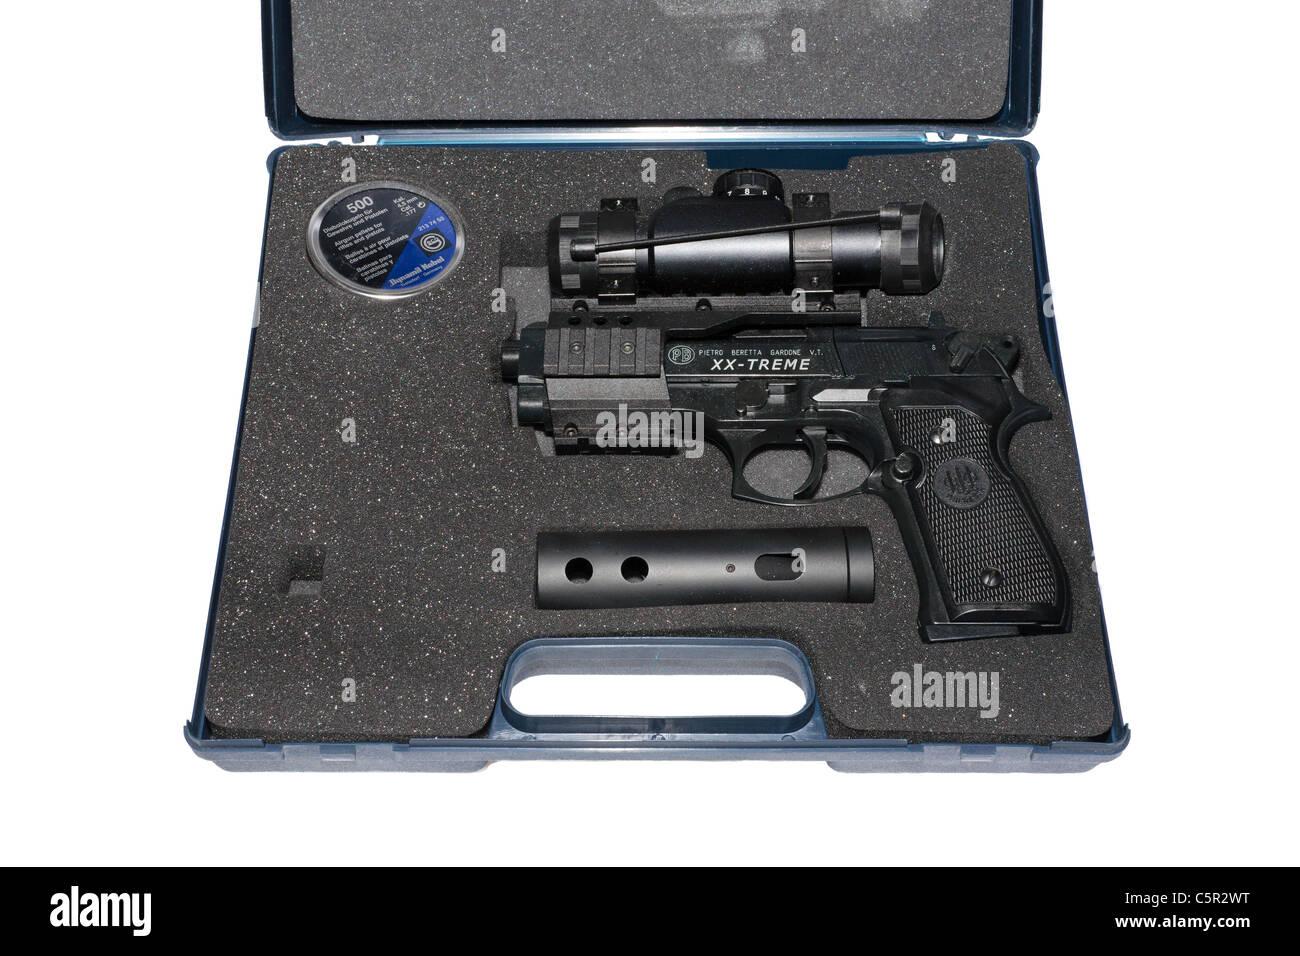 A Beretta air gun handgun powered by compressed gas, fires  022